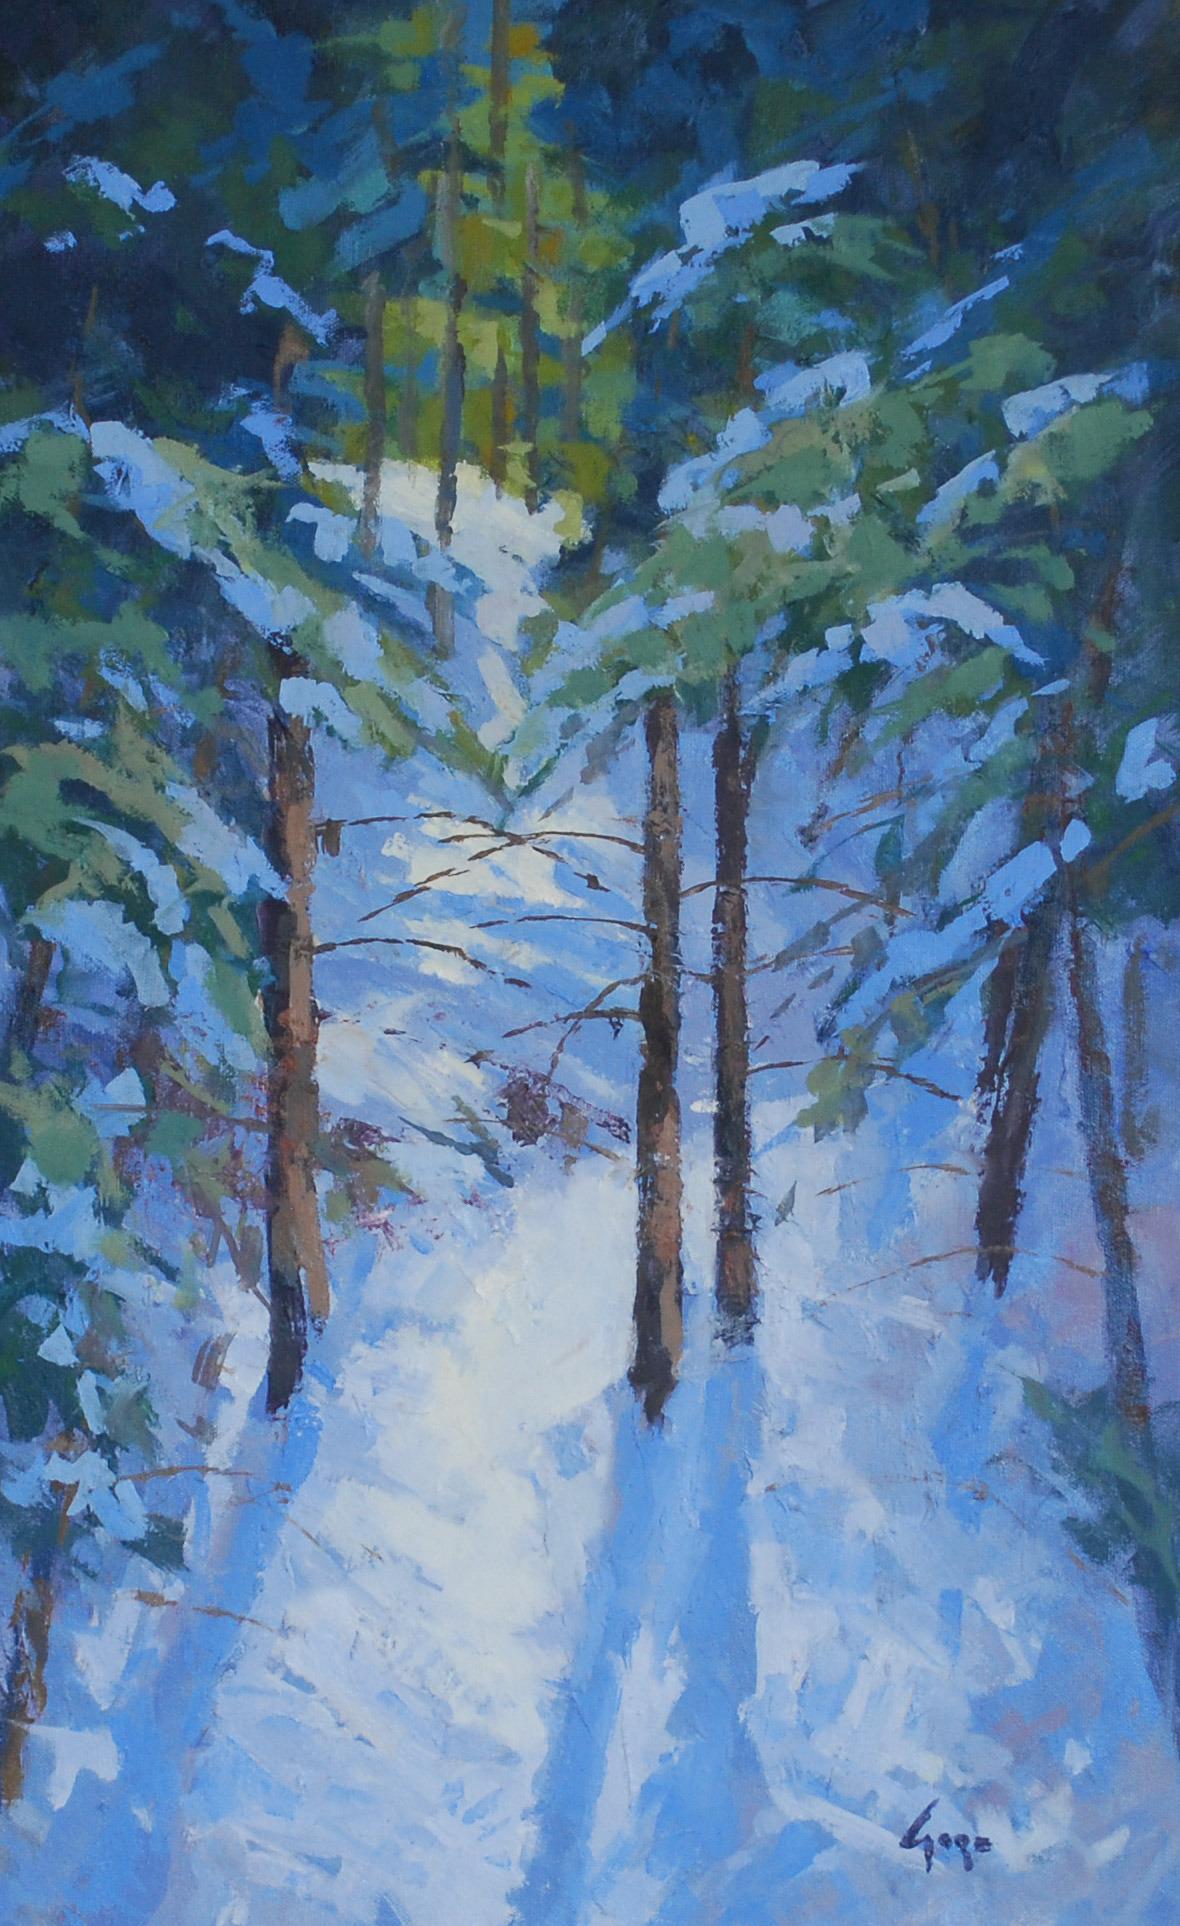 Tranquil forest se1mhn